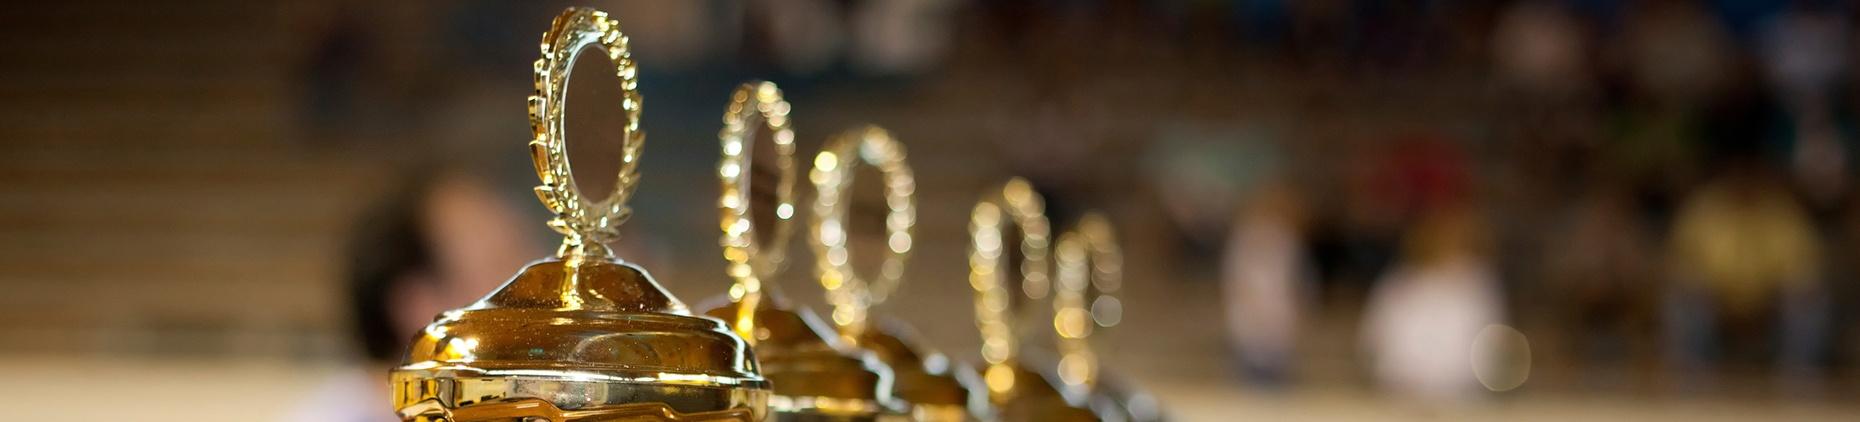 RAIN Group Brings Home 6 Top Sales Awards